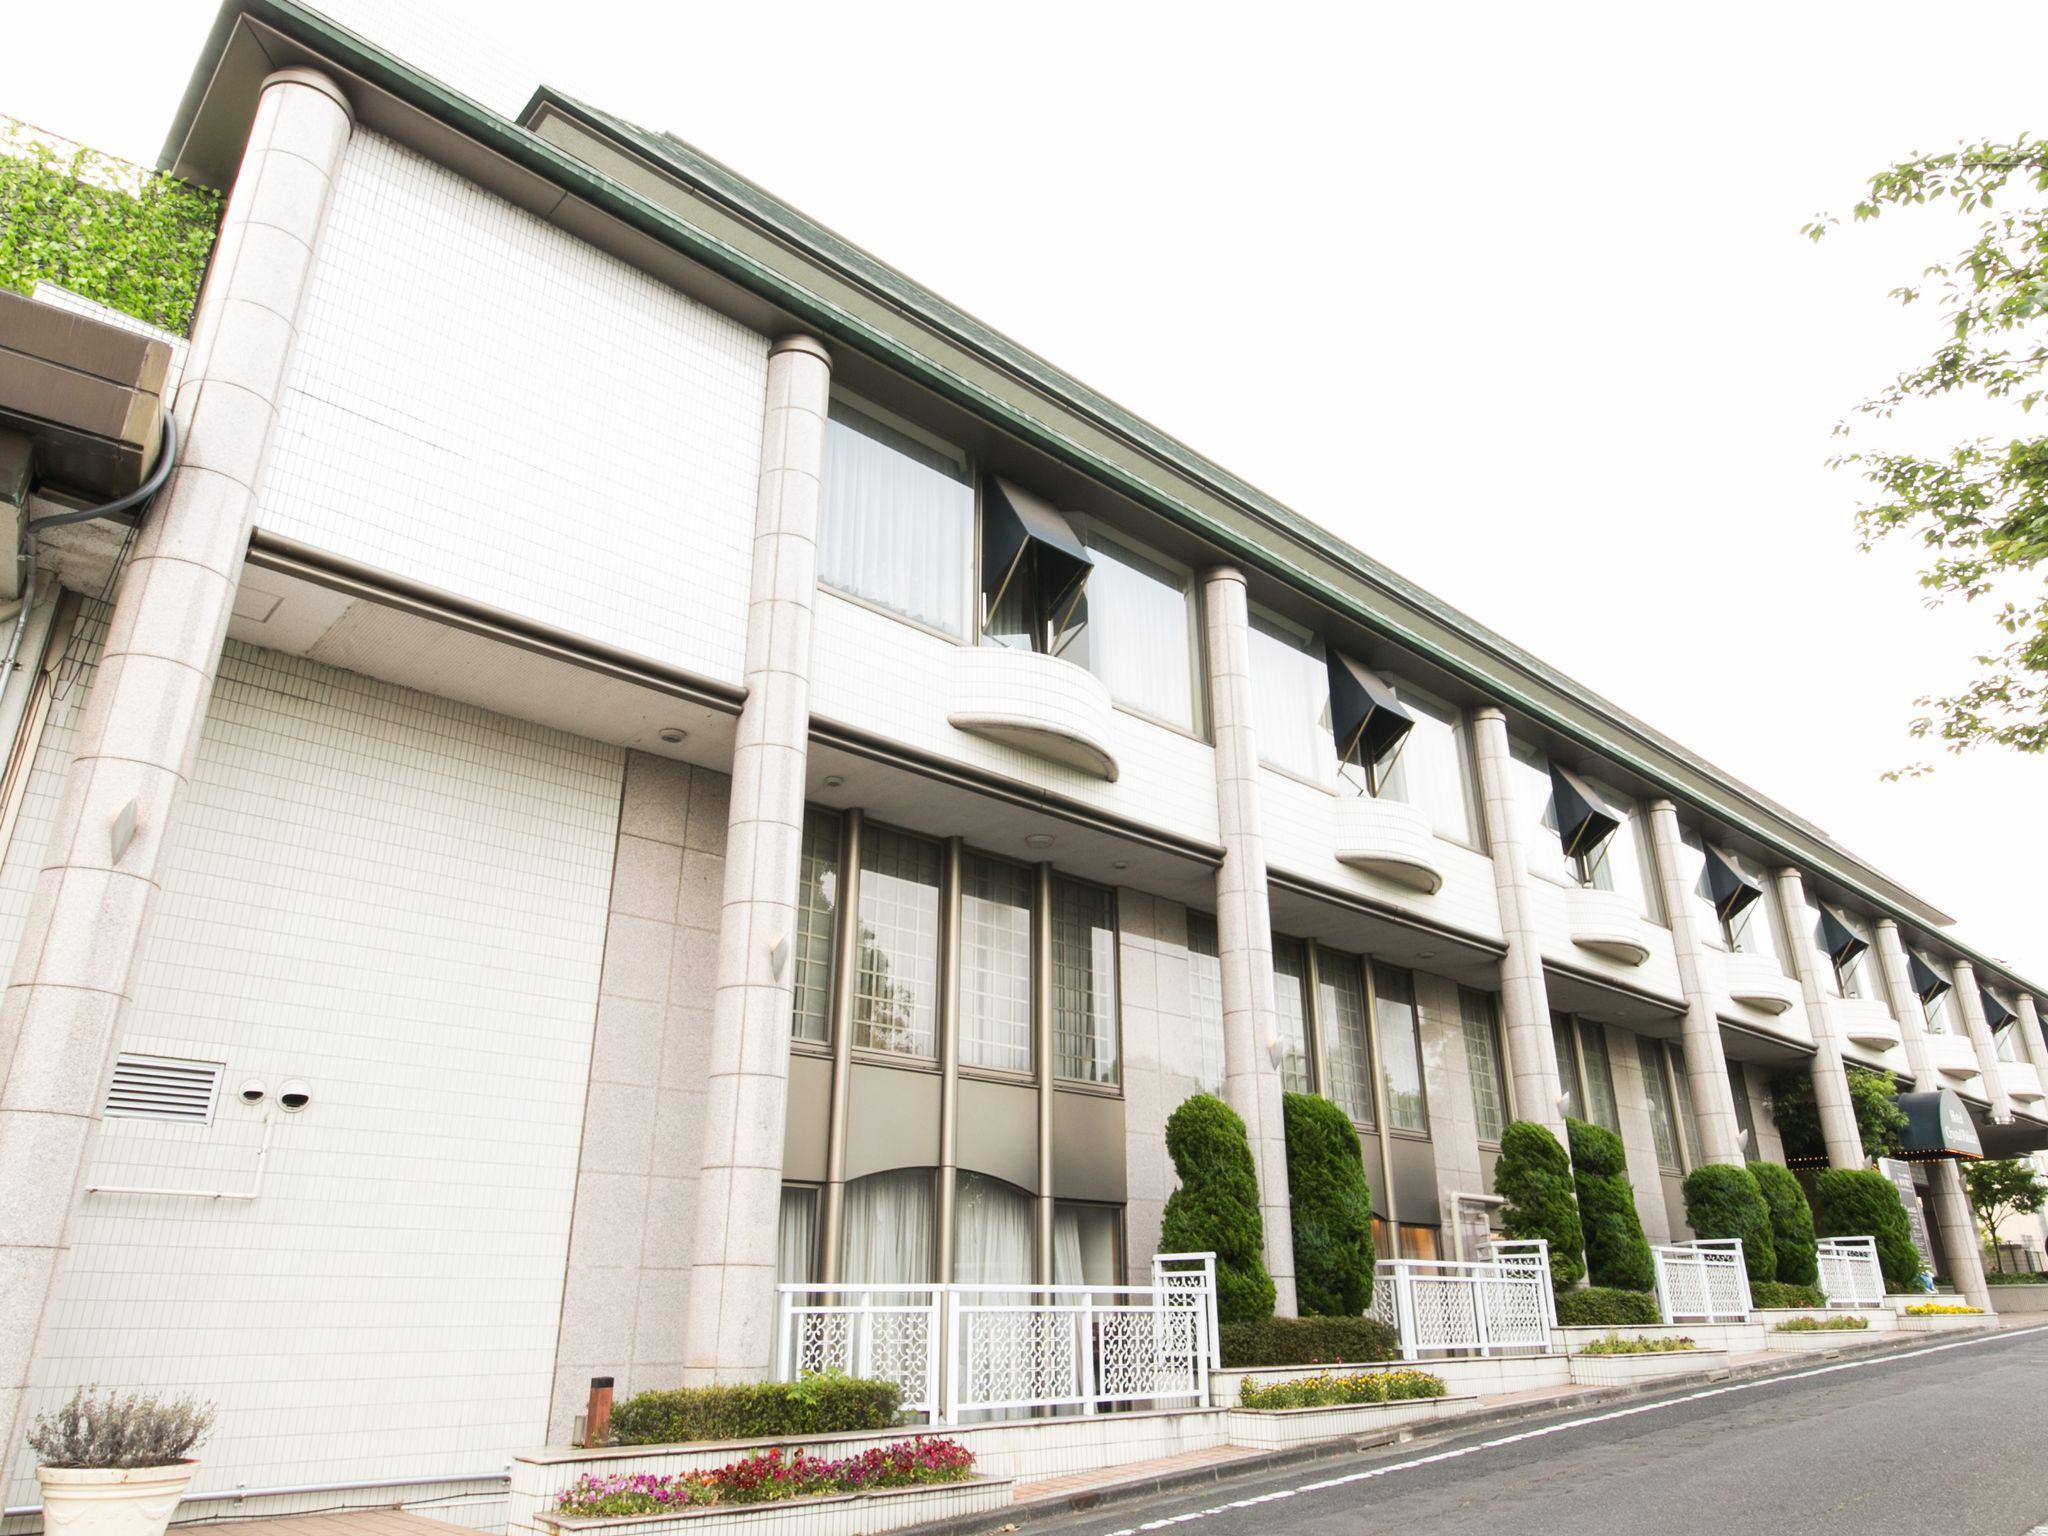 Hotel Crystal Palace, Hitachinaka